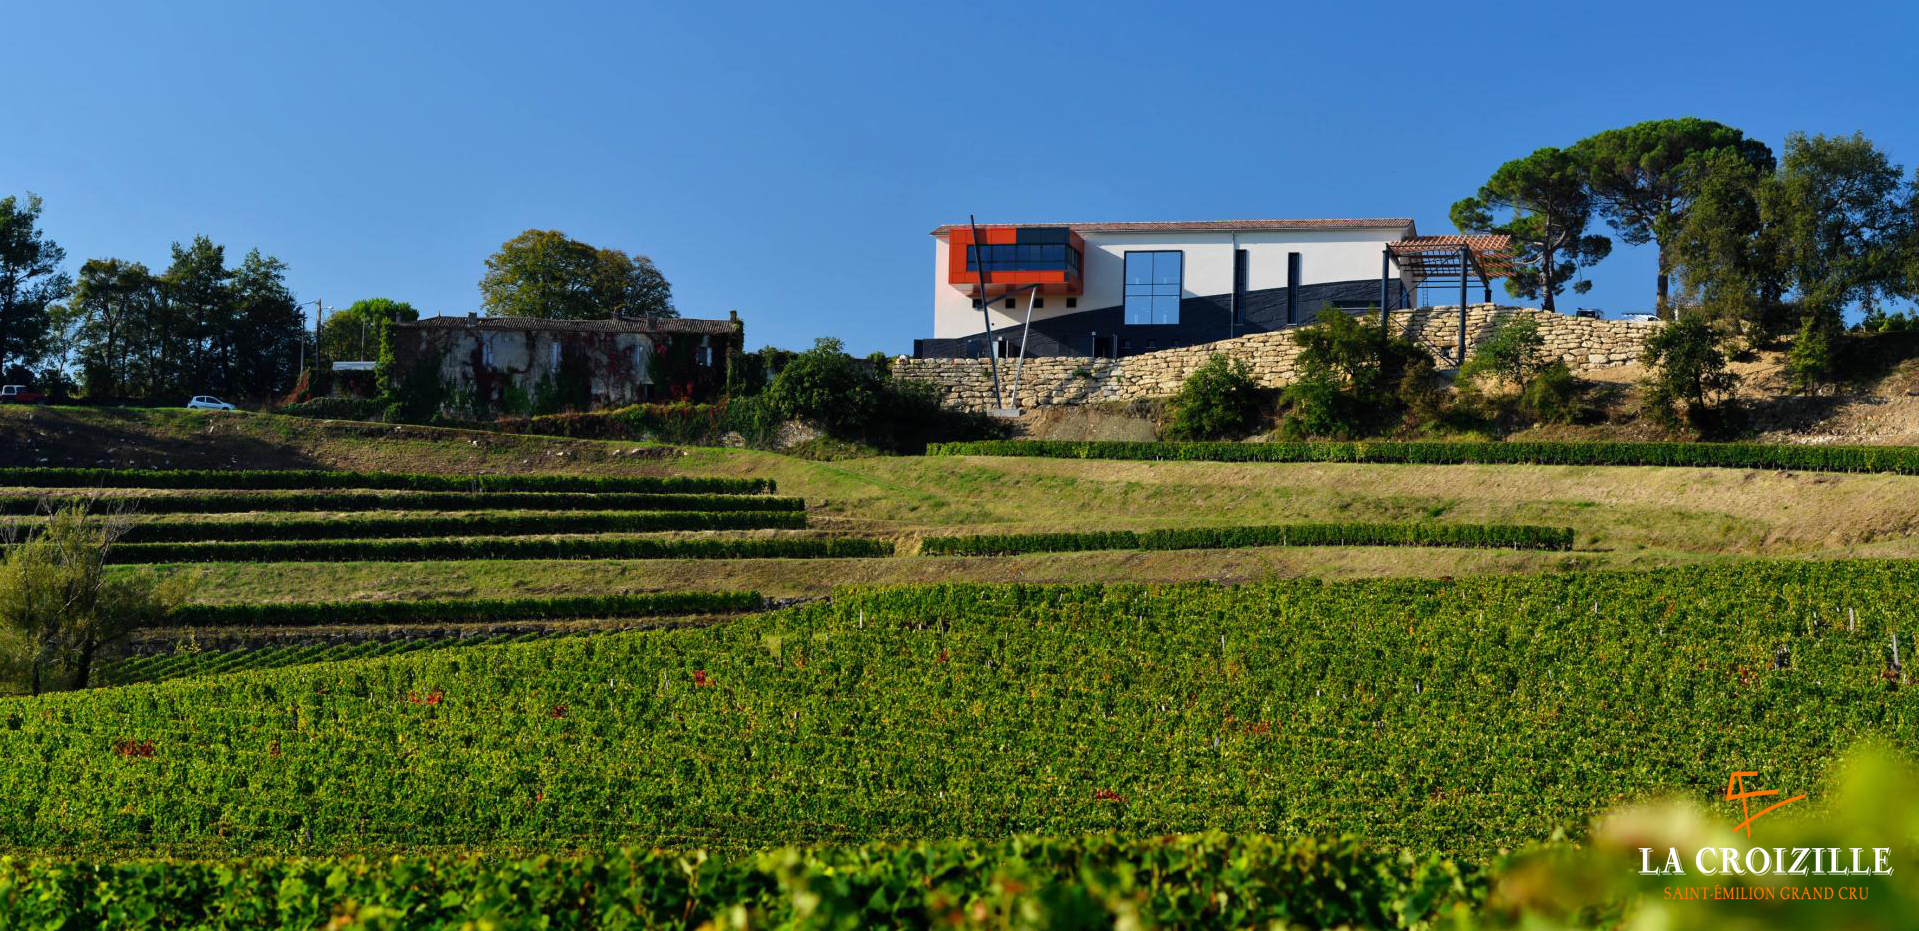 La Croizille St Emillion vineyard